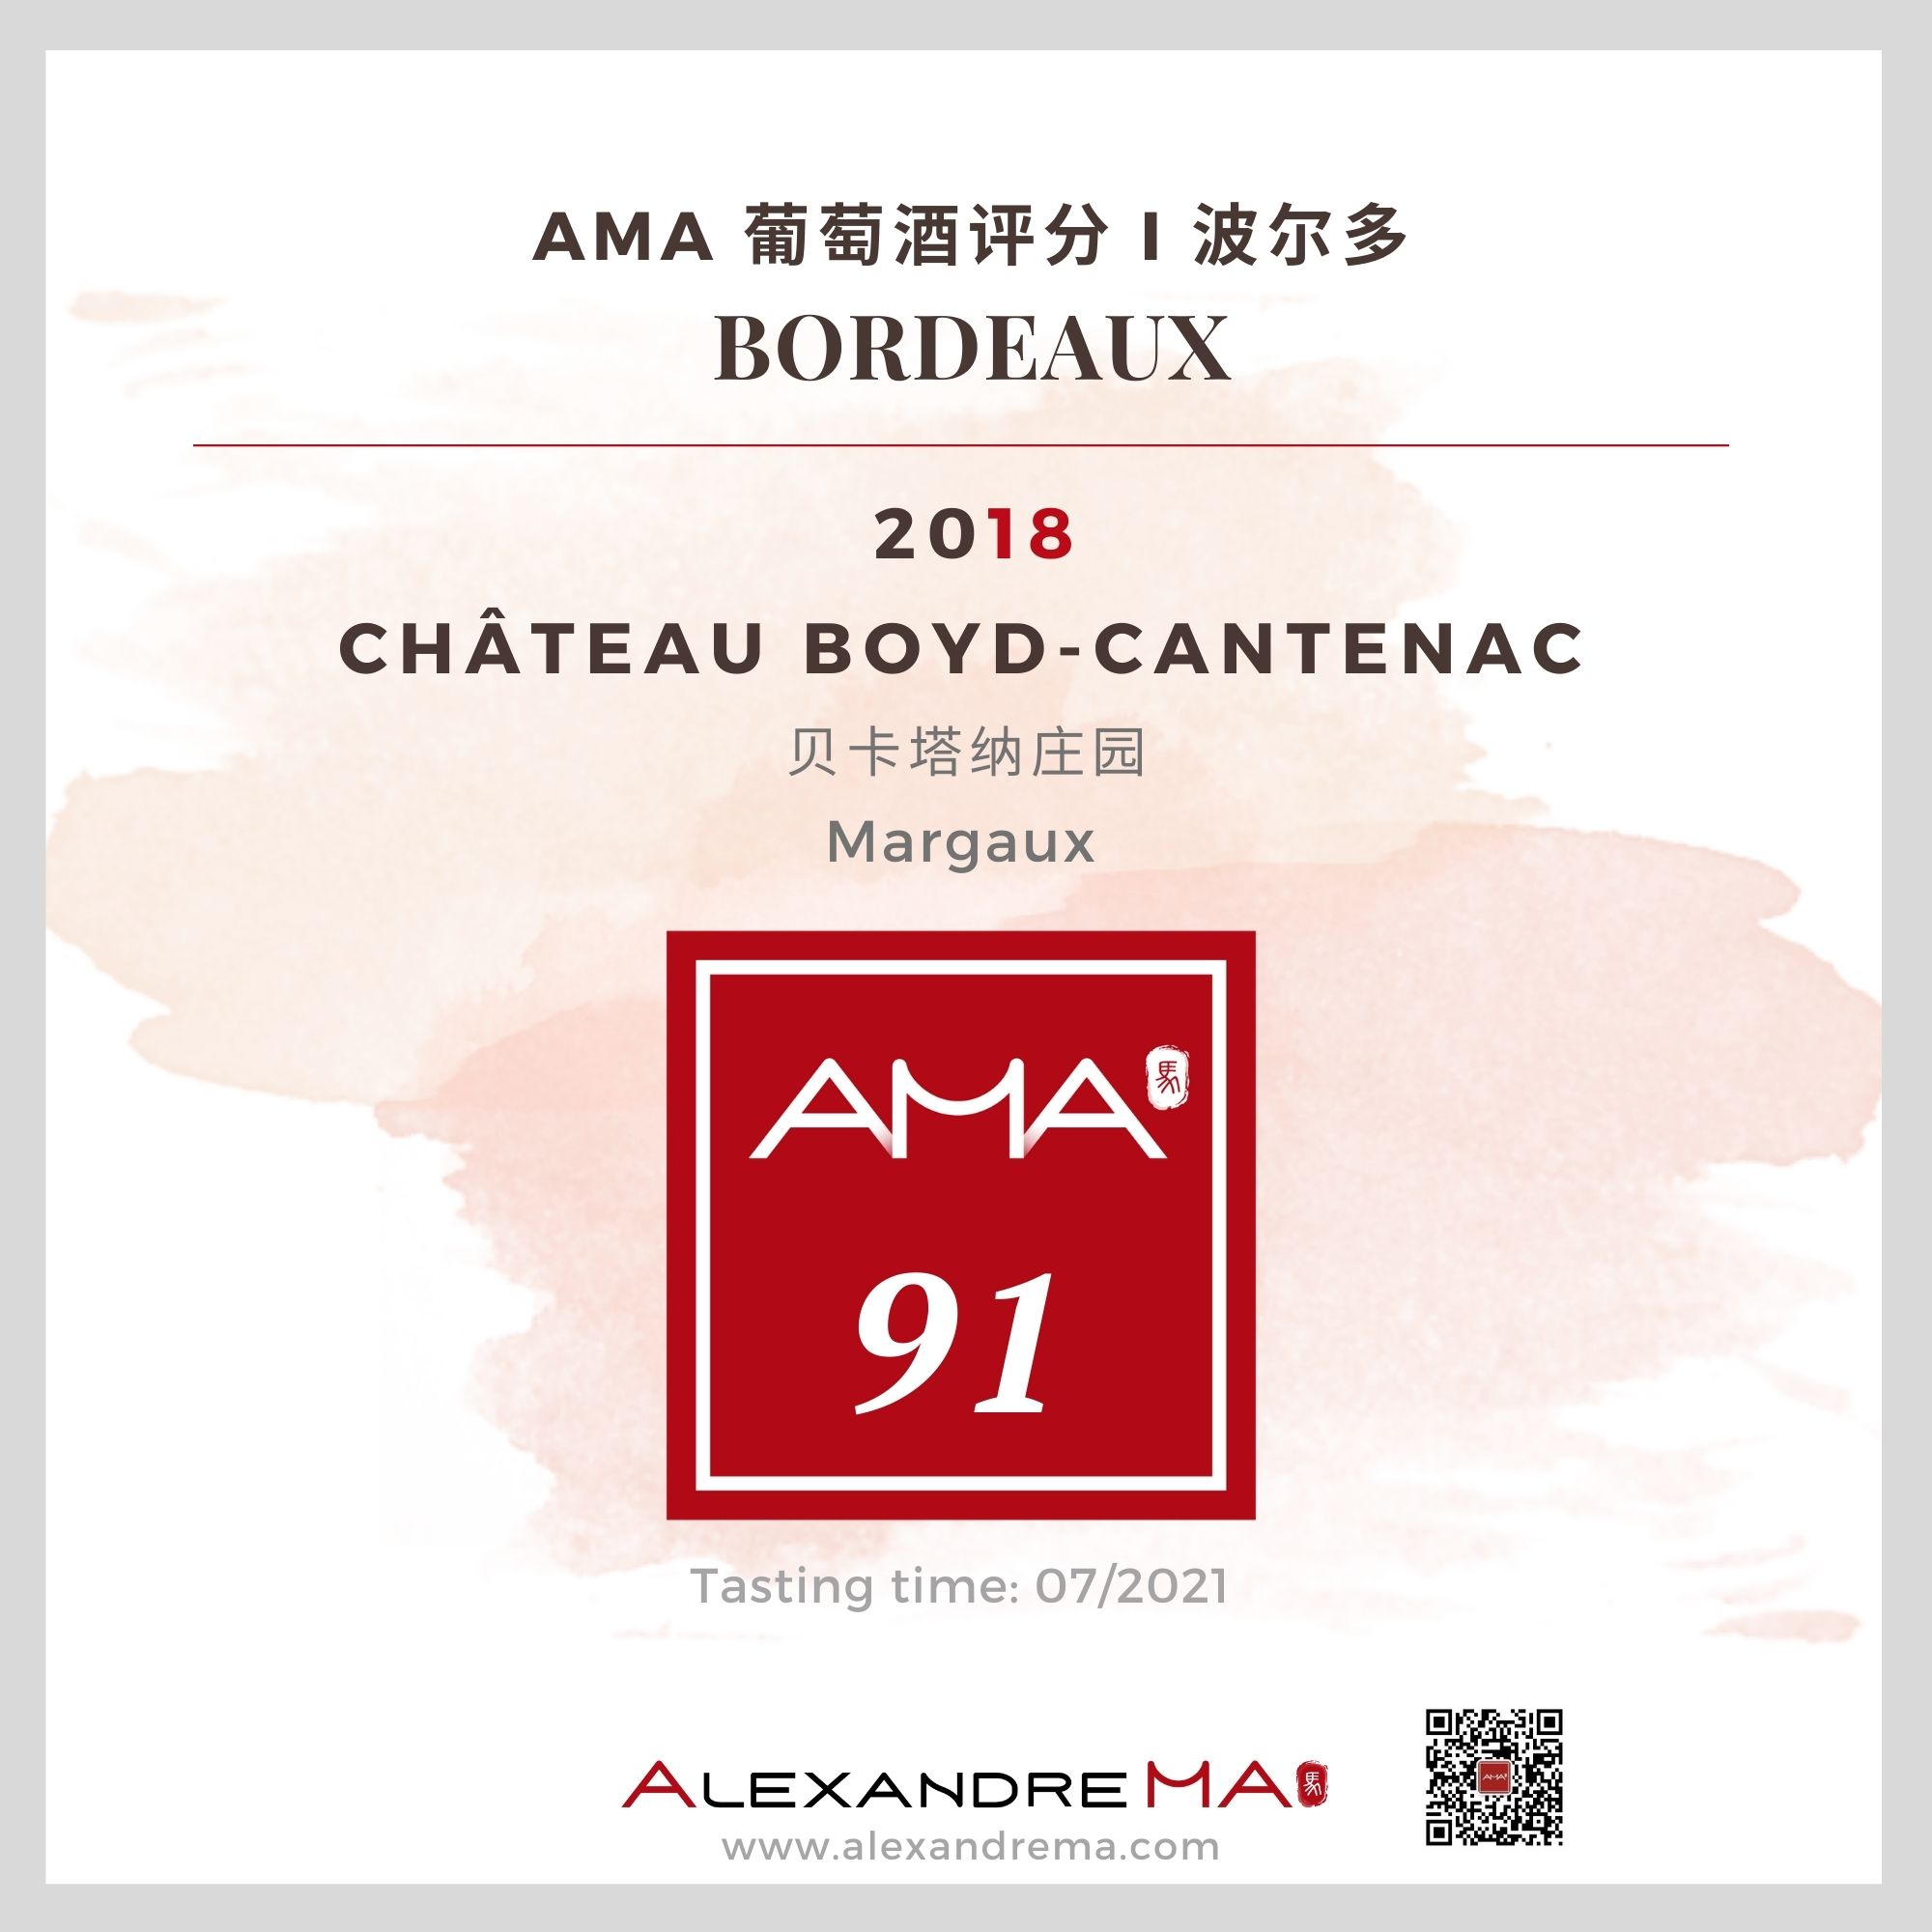 Château Boyd-Cantenac 2018 - Alexandre MA